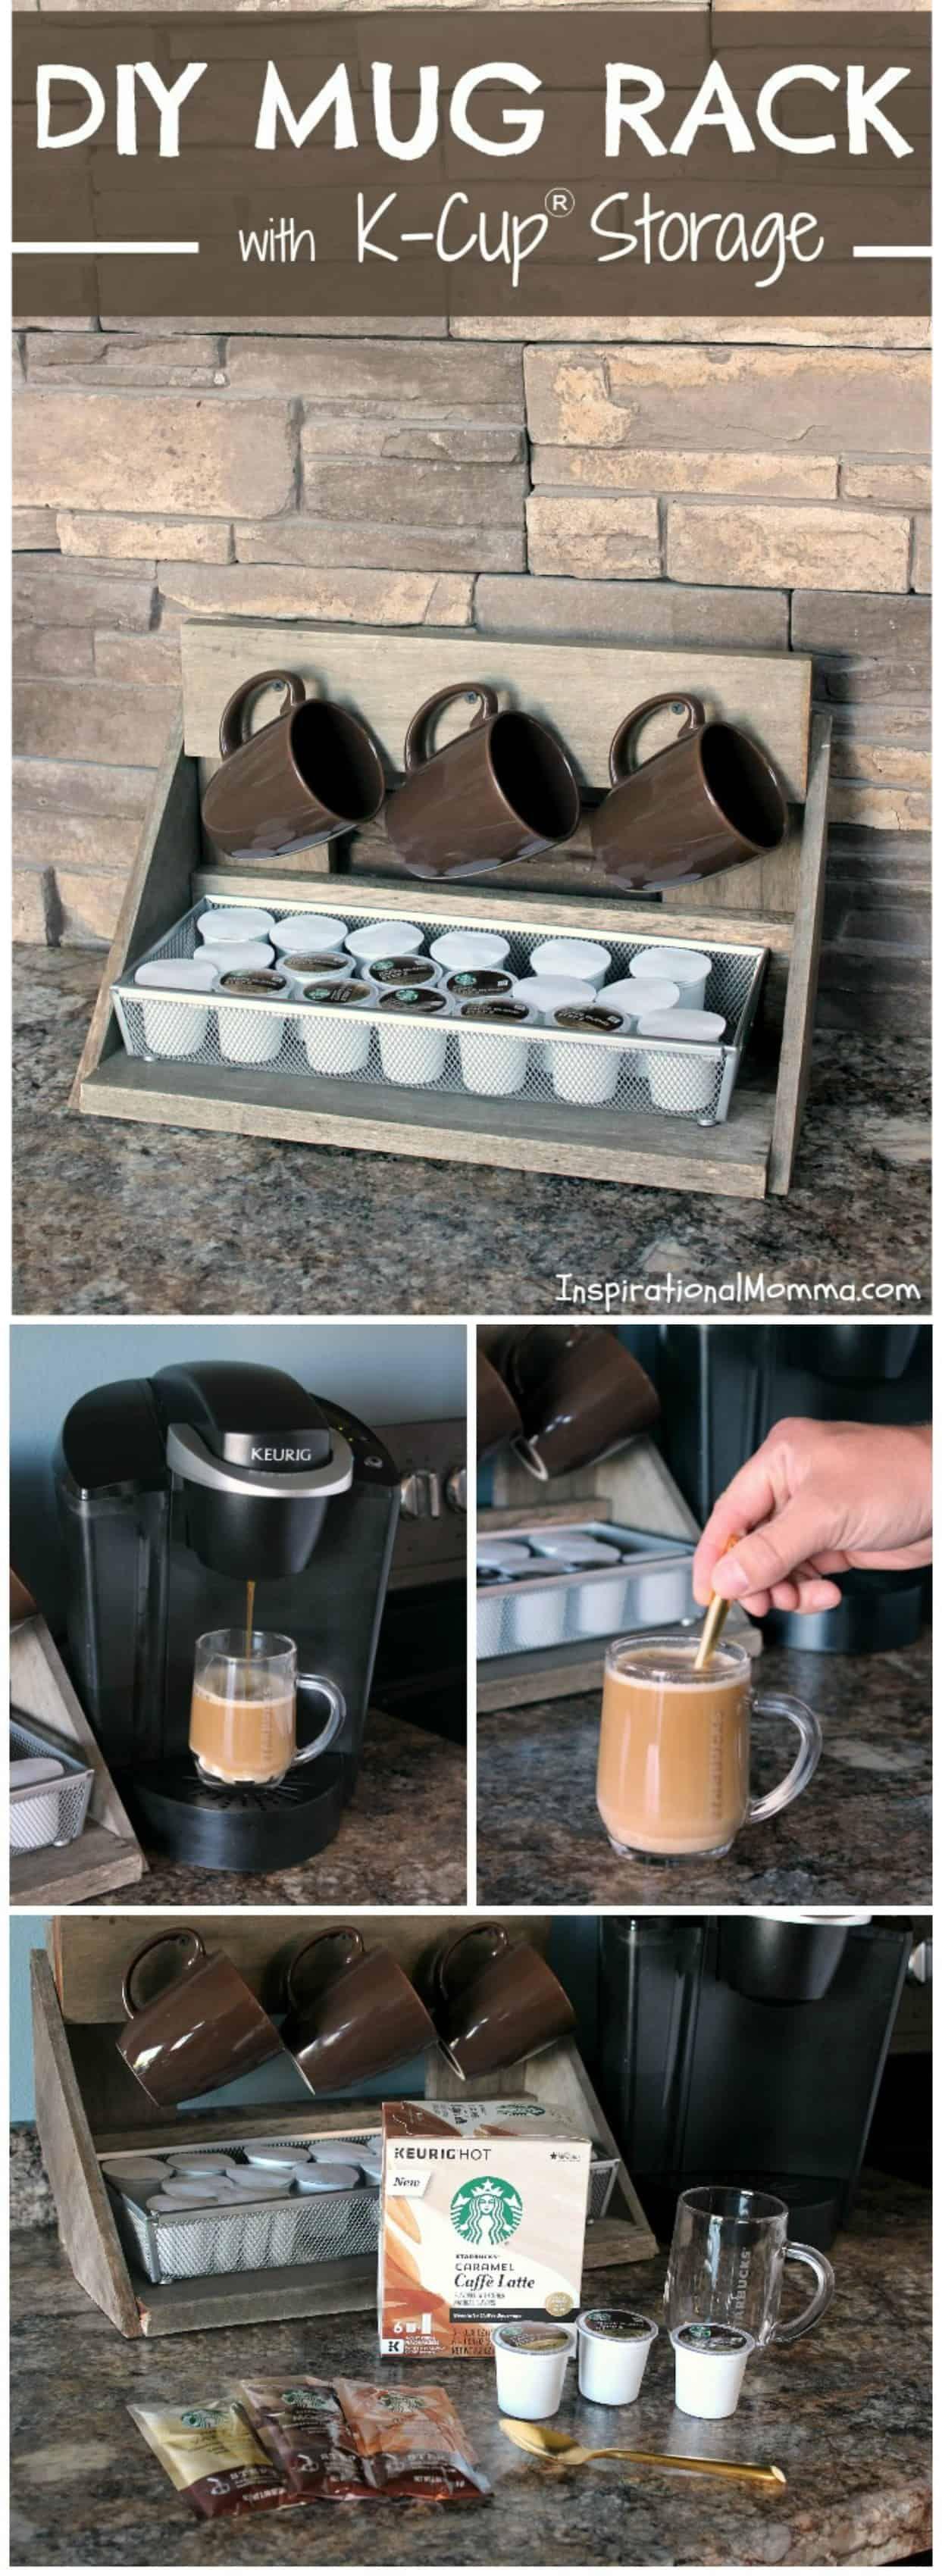 DIY Mug Rack with K-Cup Storage